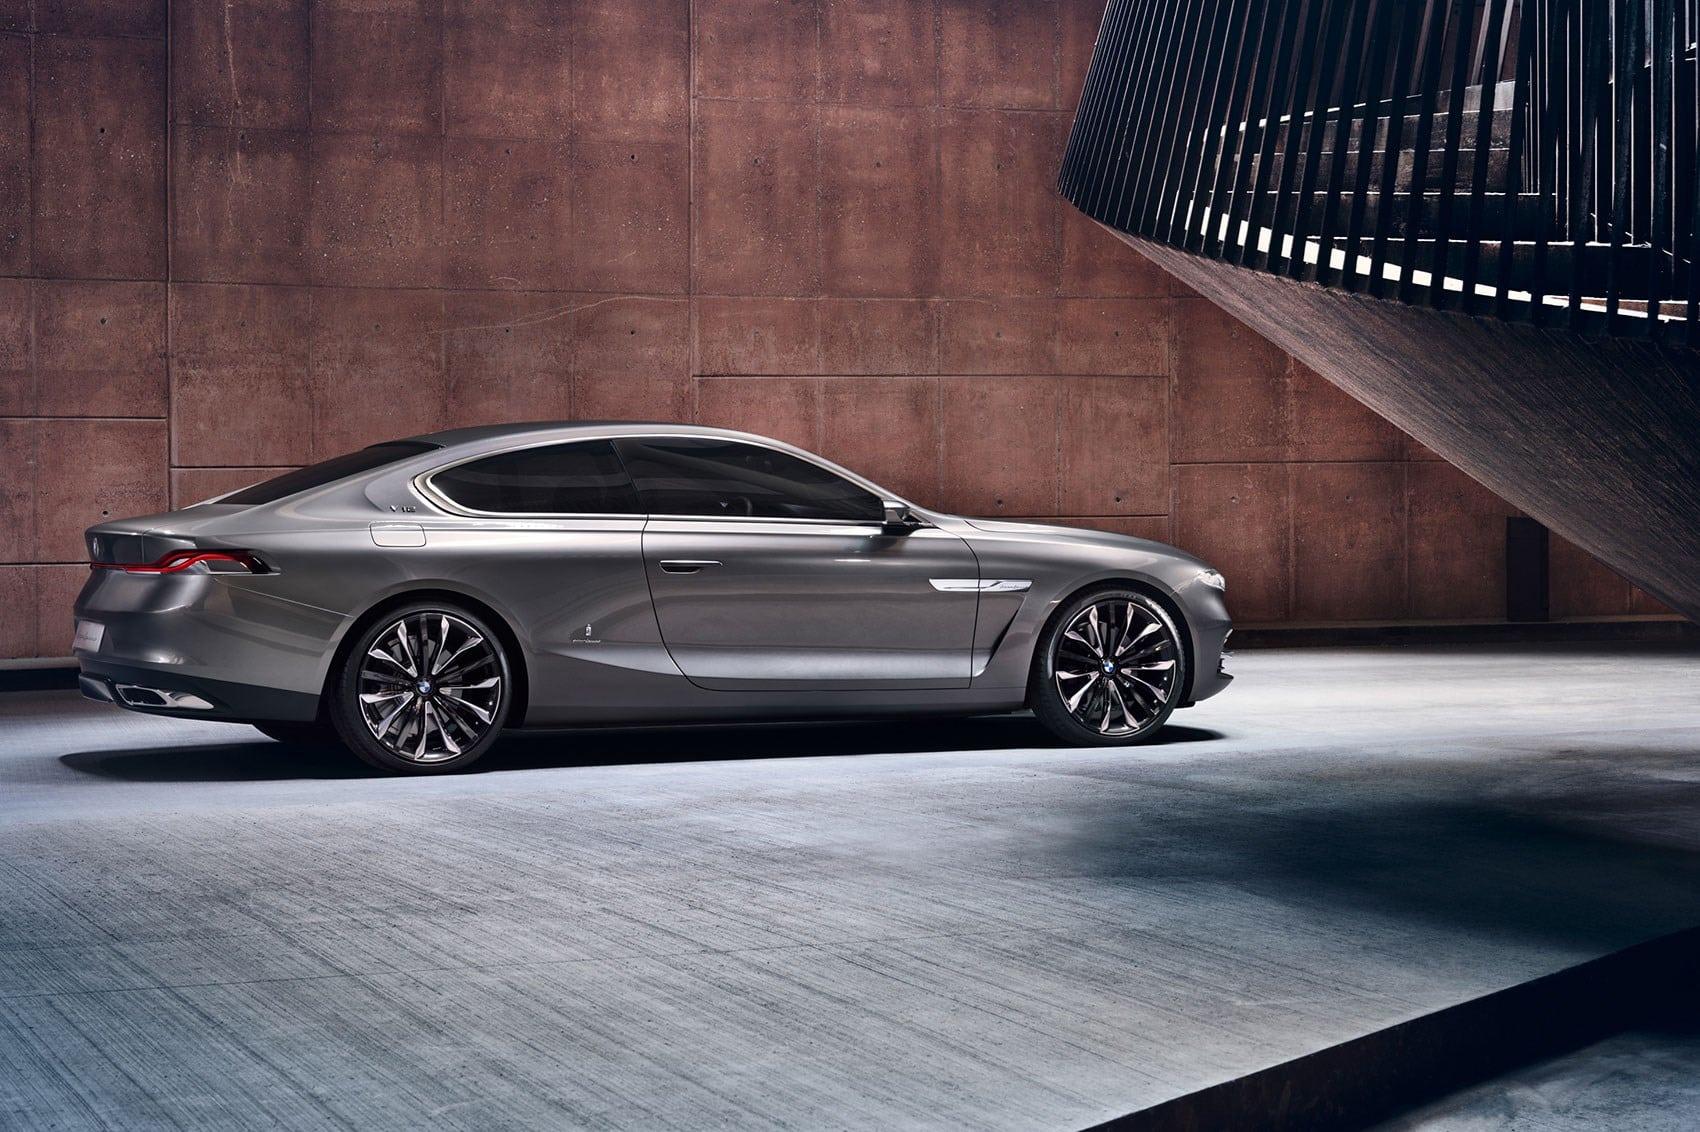 2020 BMW 530e Powertrain